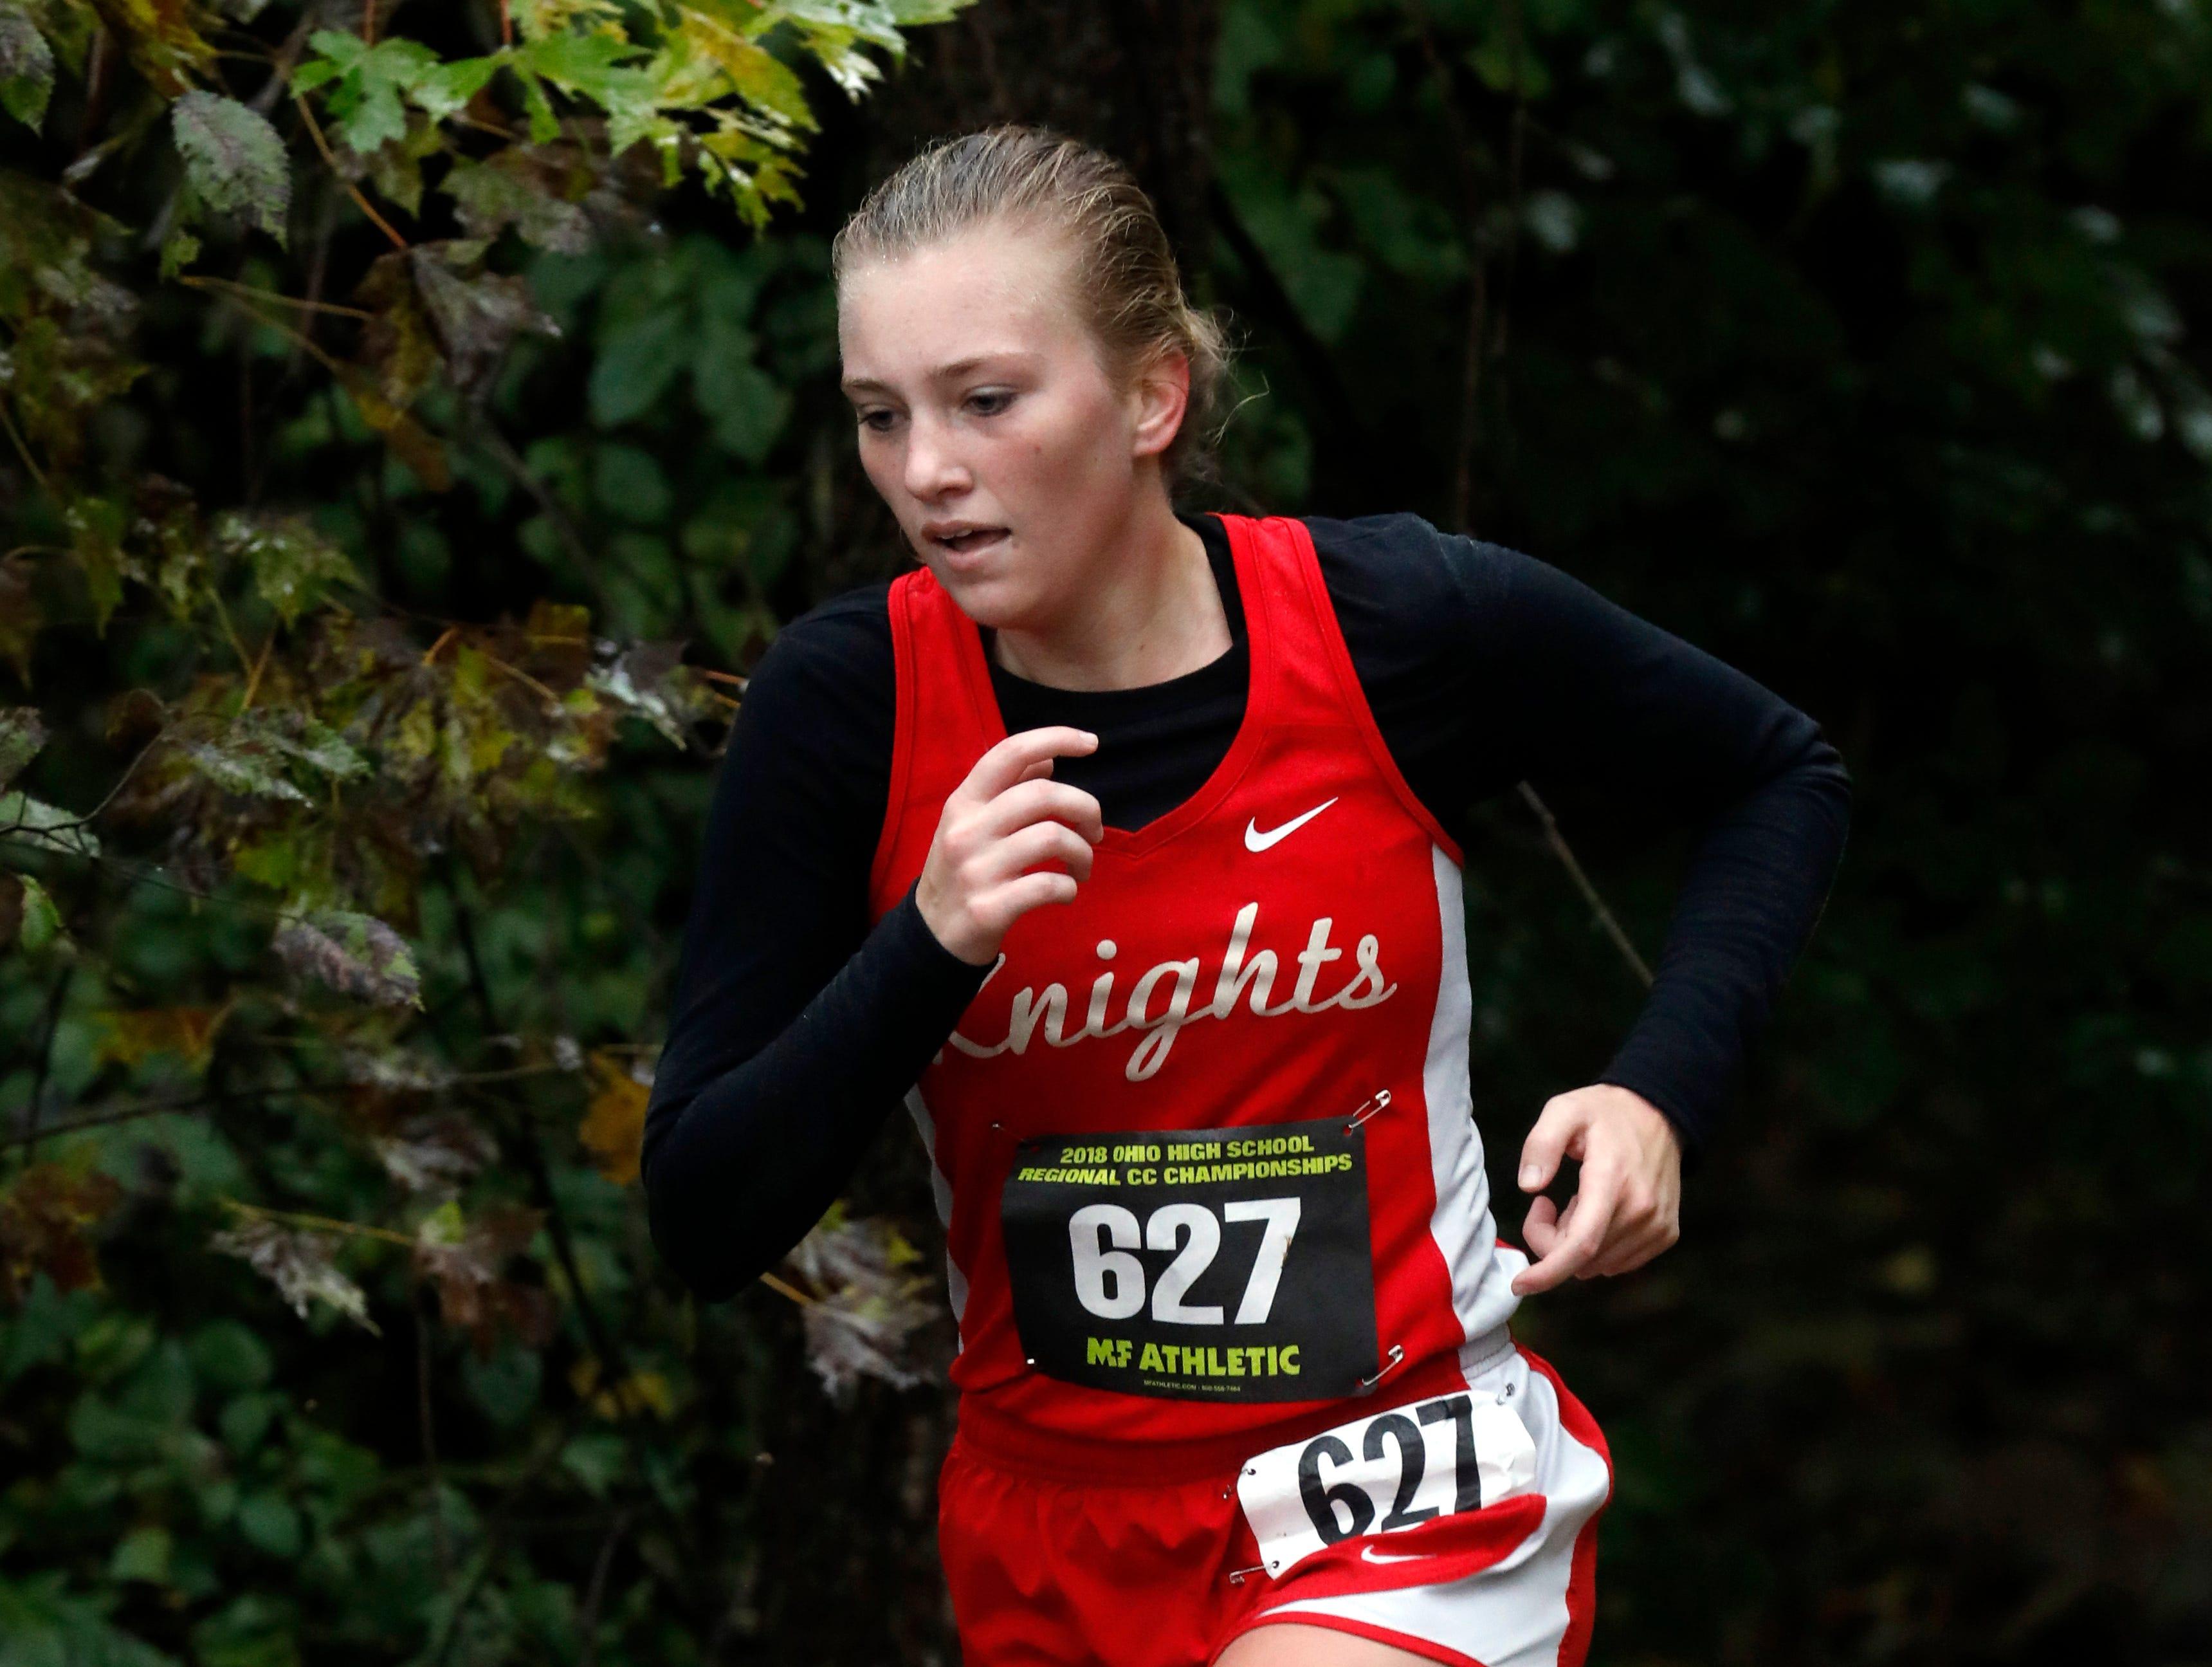 Fairfield Christian's Emma Seals runs in the Regional Cross Country meet Saturday, Oct. 27, 2018, at Pickerington North High School in Pickerington.